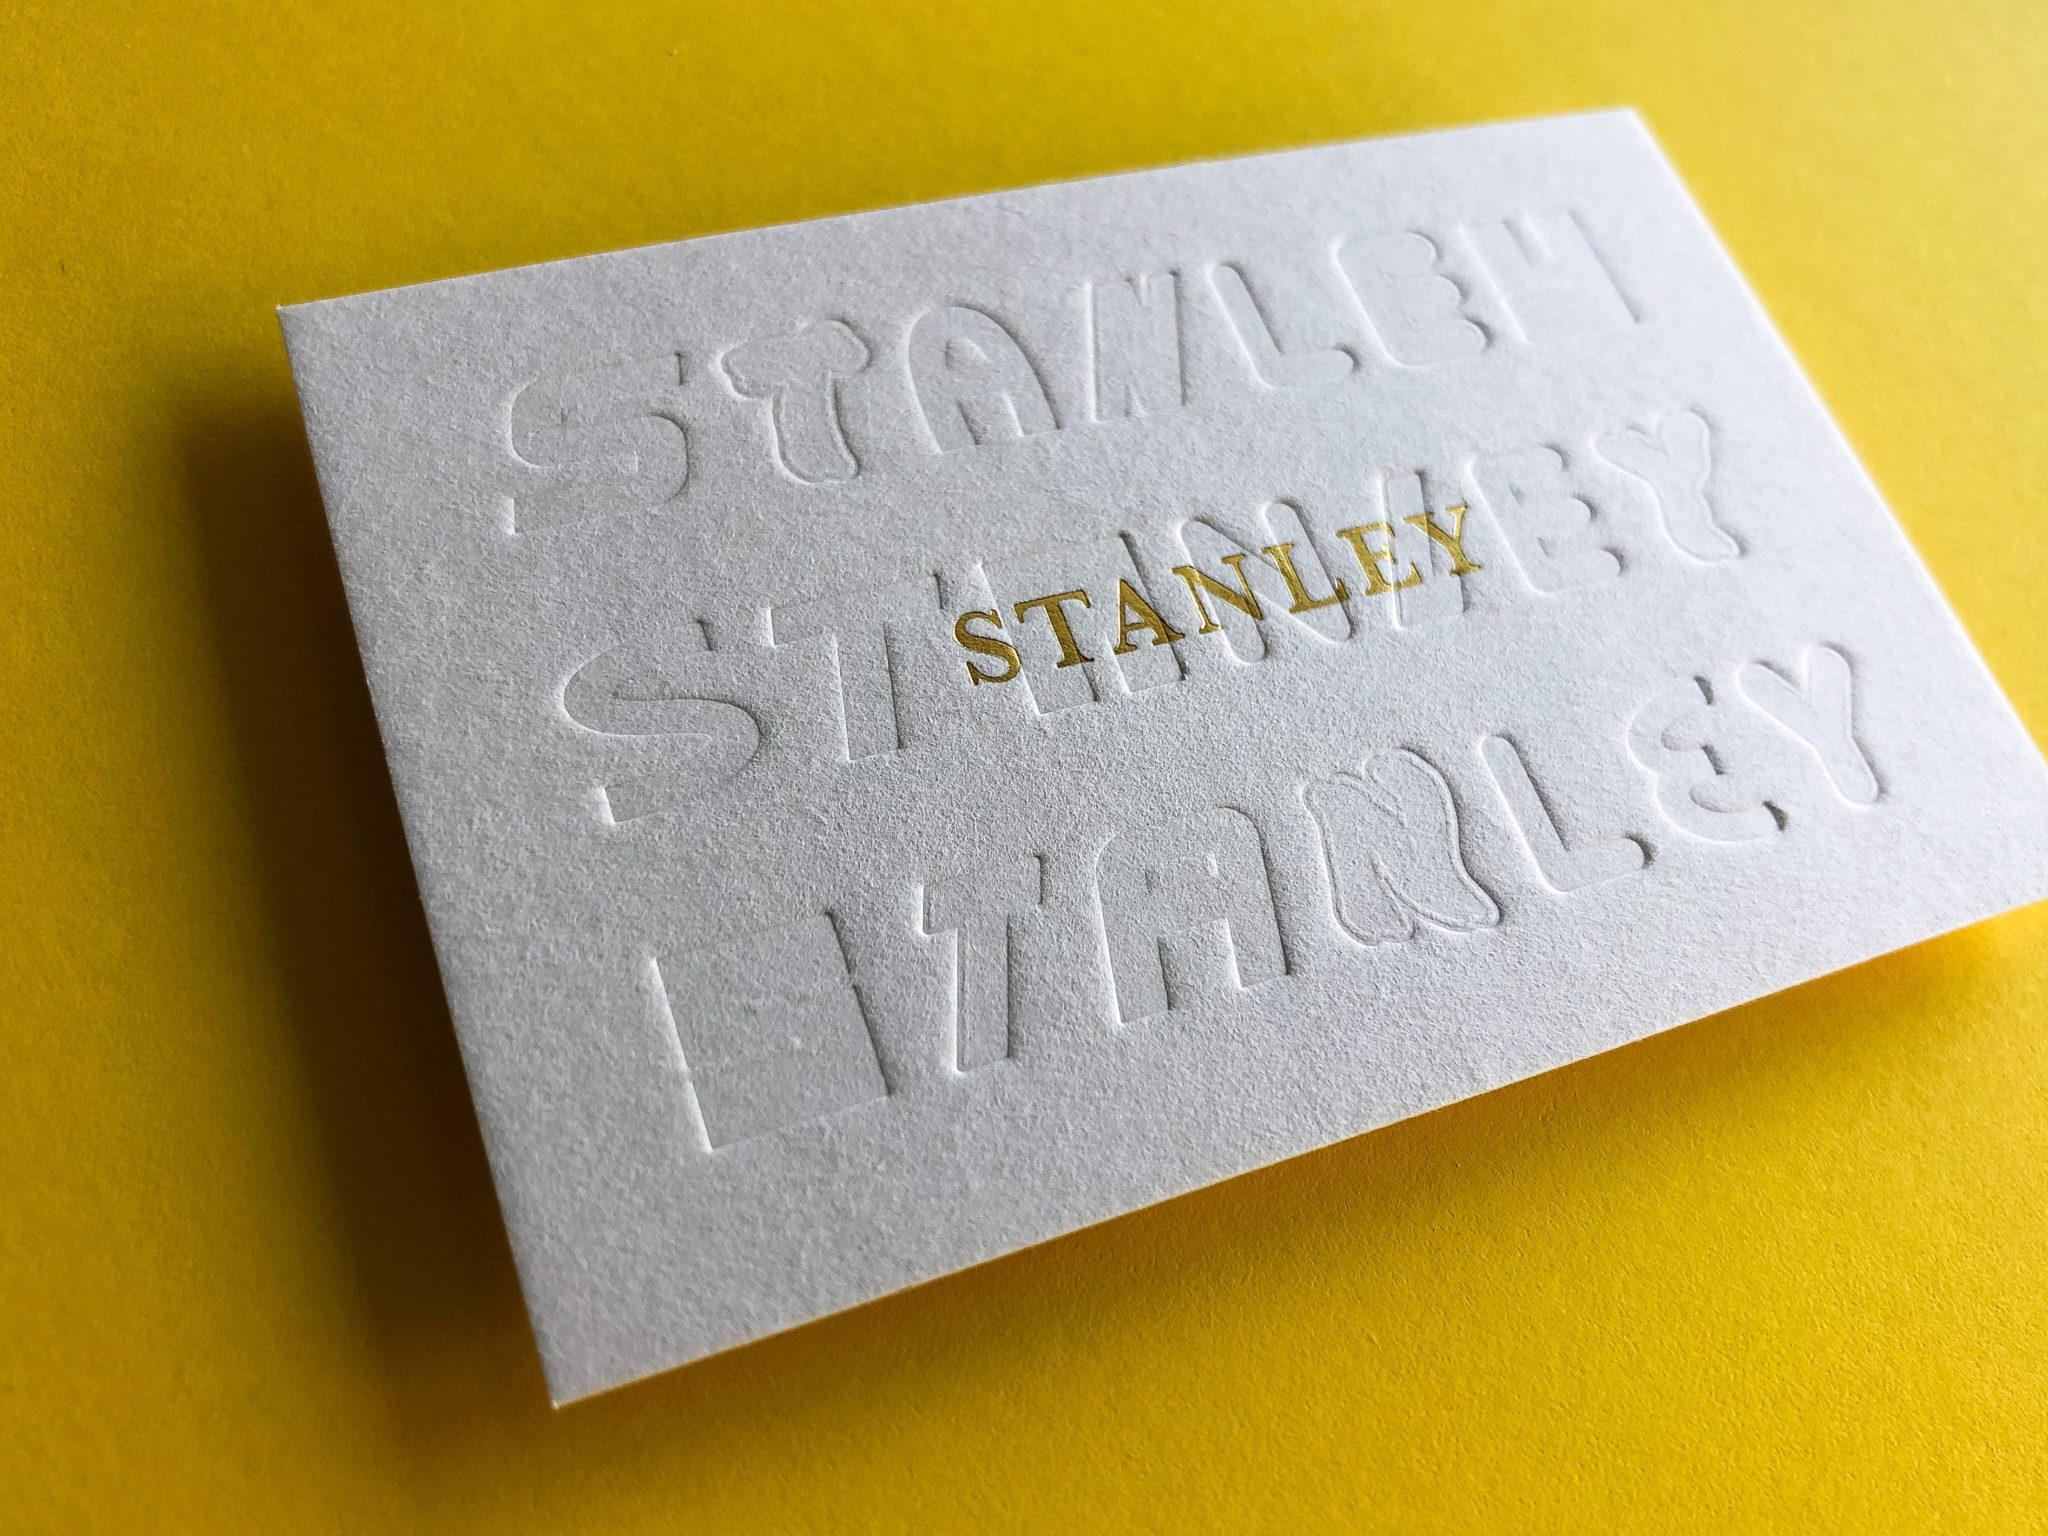 Gold Foil and Letterpress Business Cards for Stanley on Beer Matt Board 1